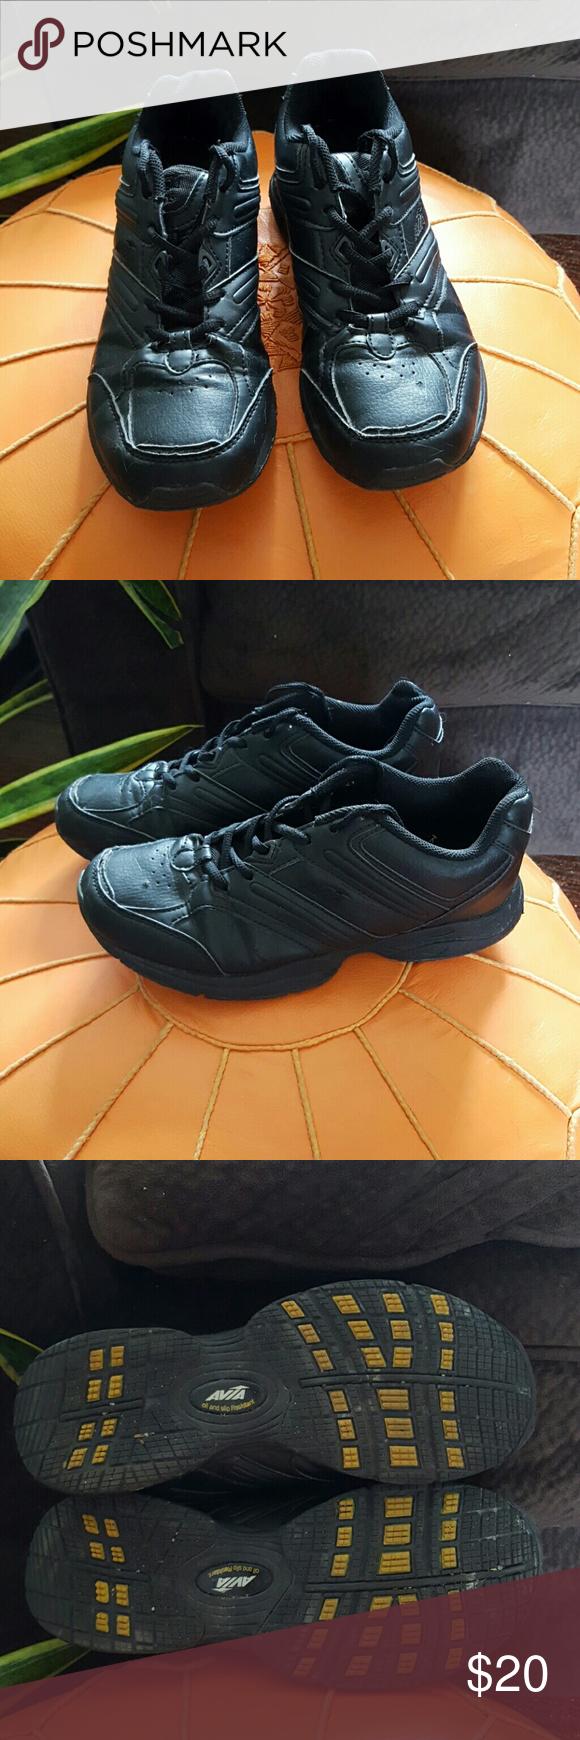 Avia Non Slip Shoes   Slip resistant